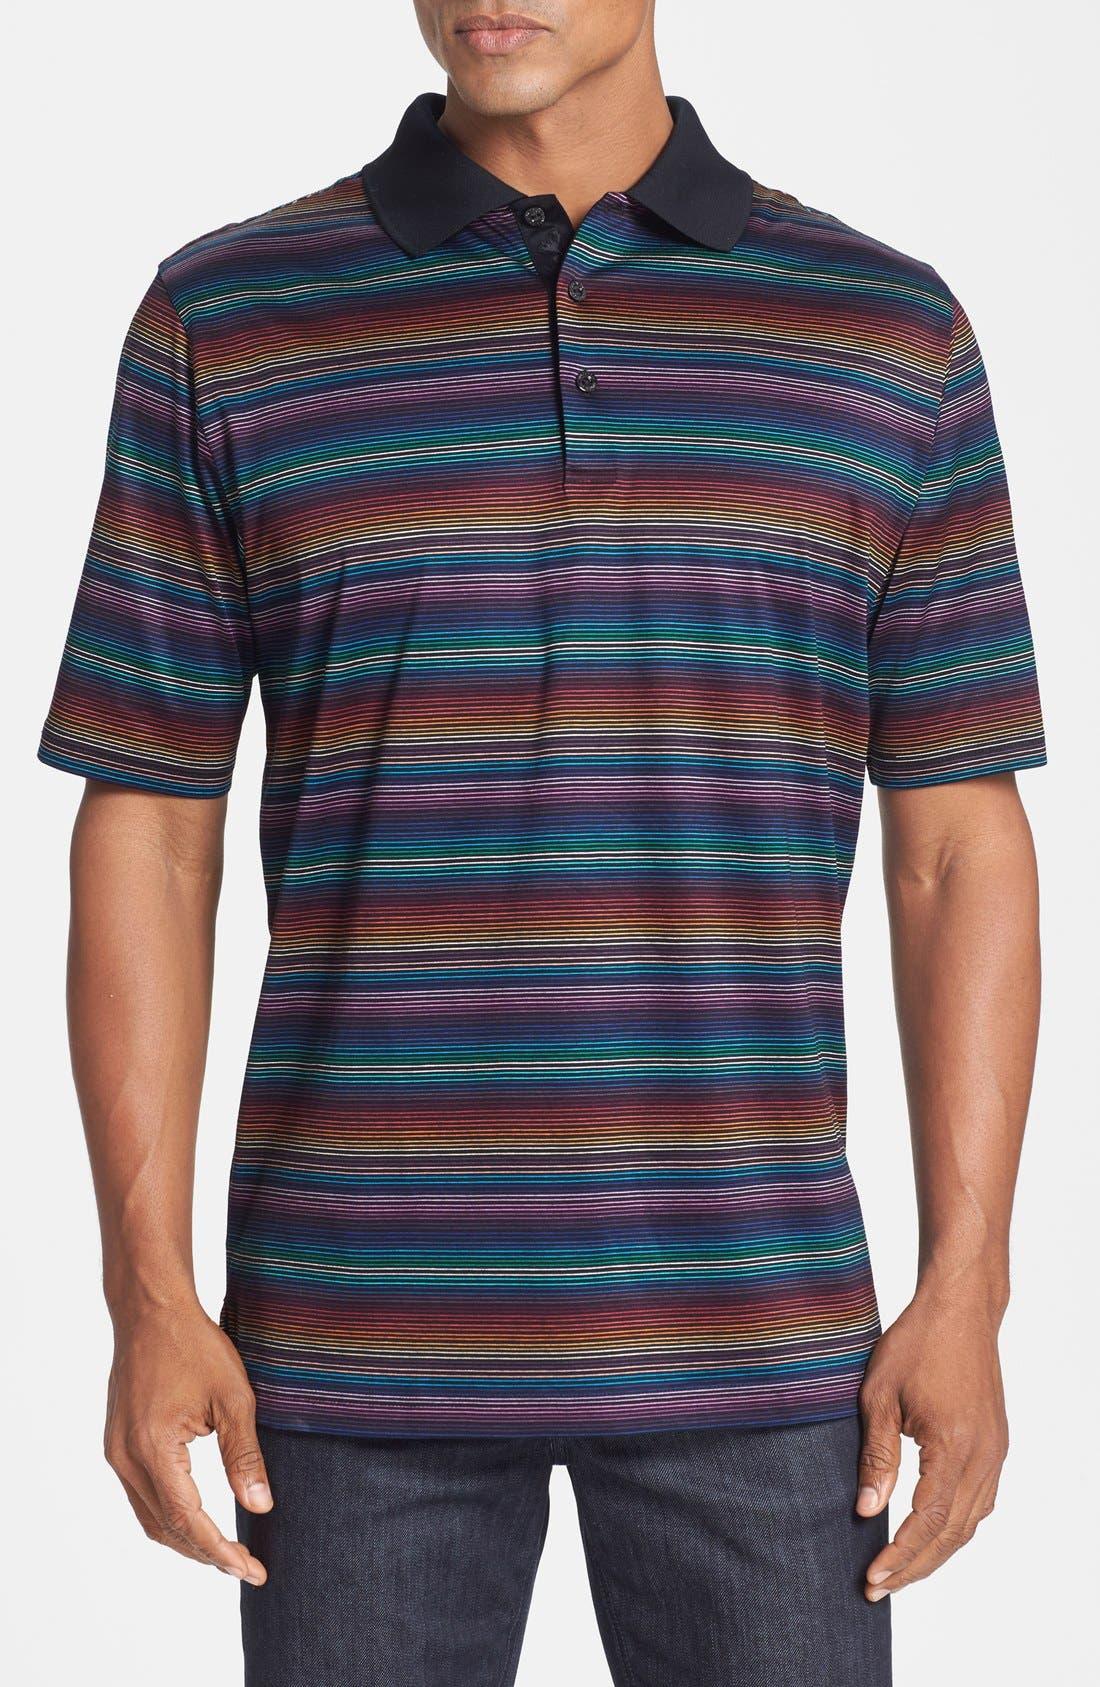 Alternate Image 1 Selected - Bugatchi Multicolor Stripe Polo